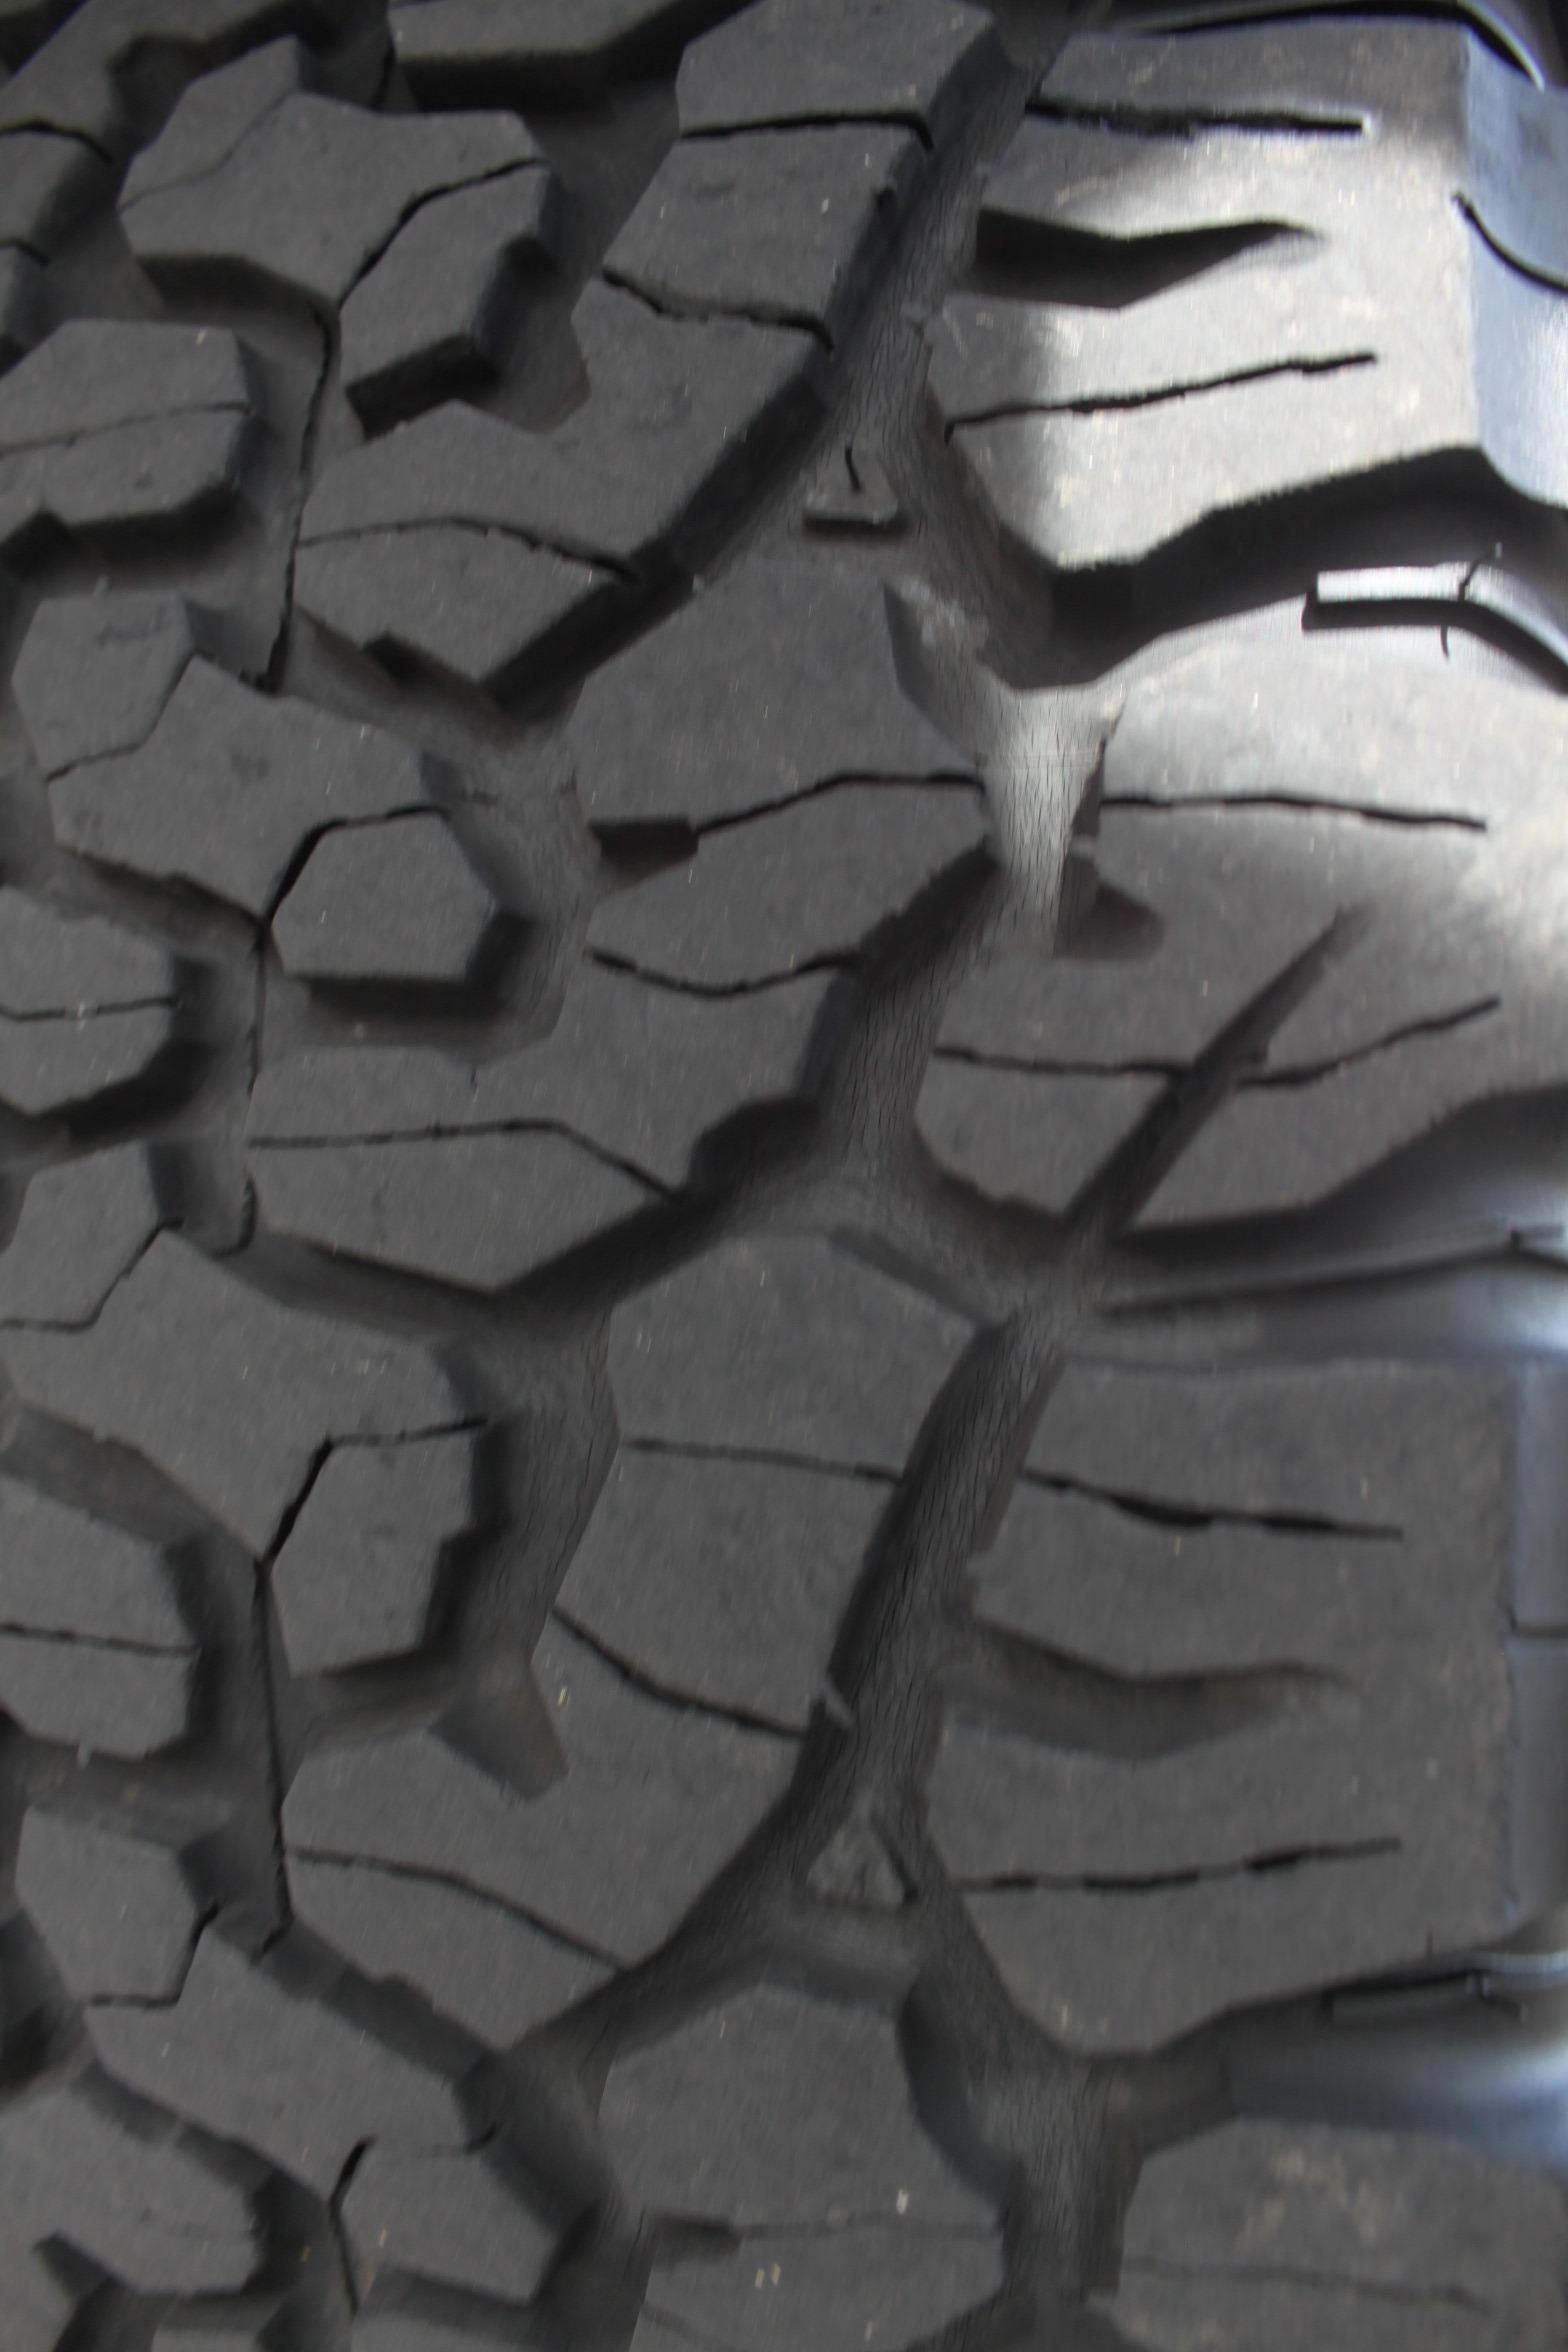 Used-2012-Jeep-Wrangler-Freedom-Edition-4X4-Wrangler